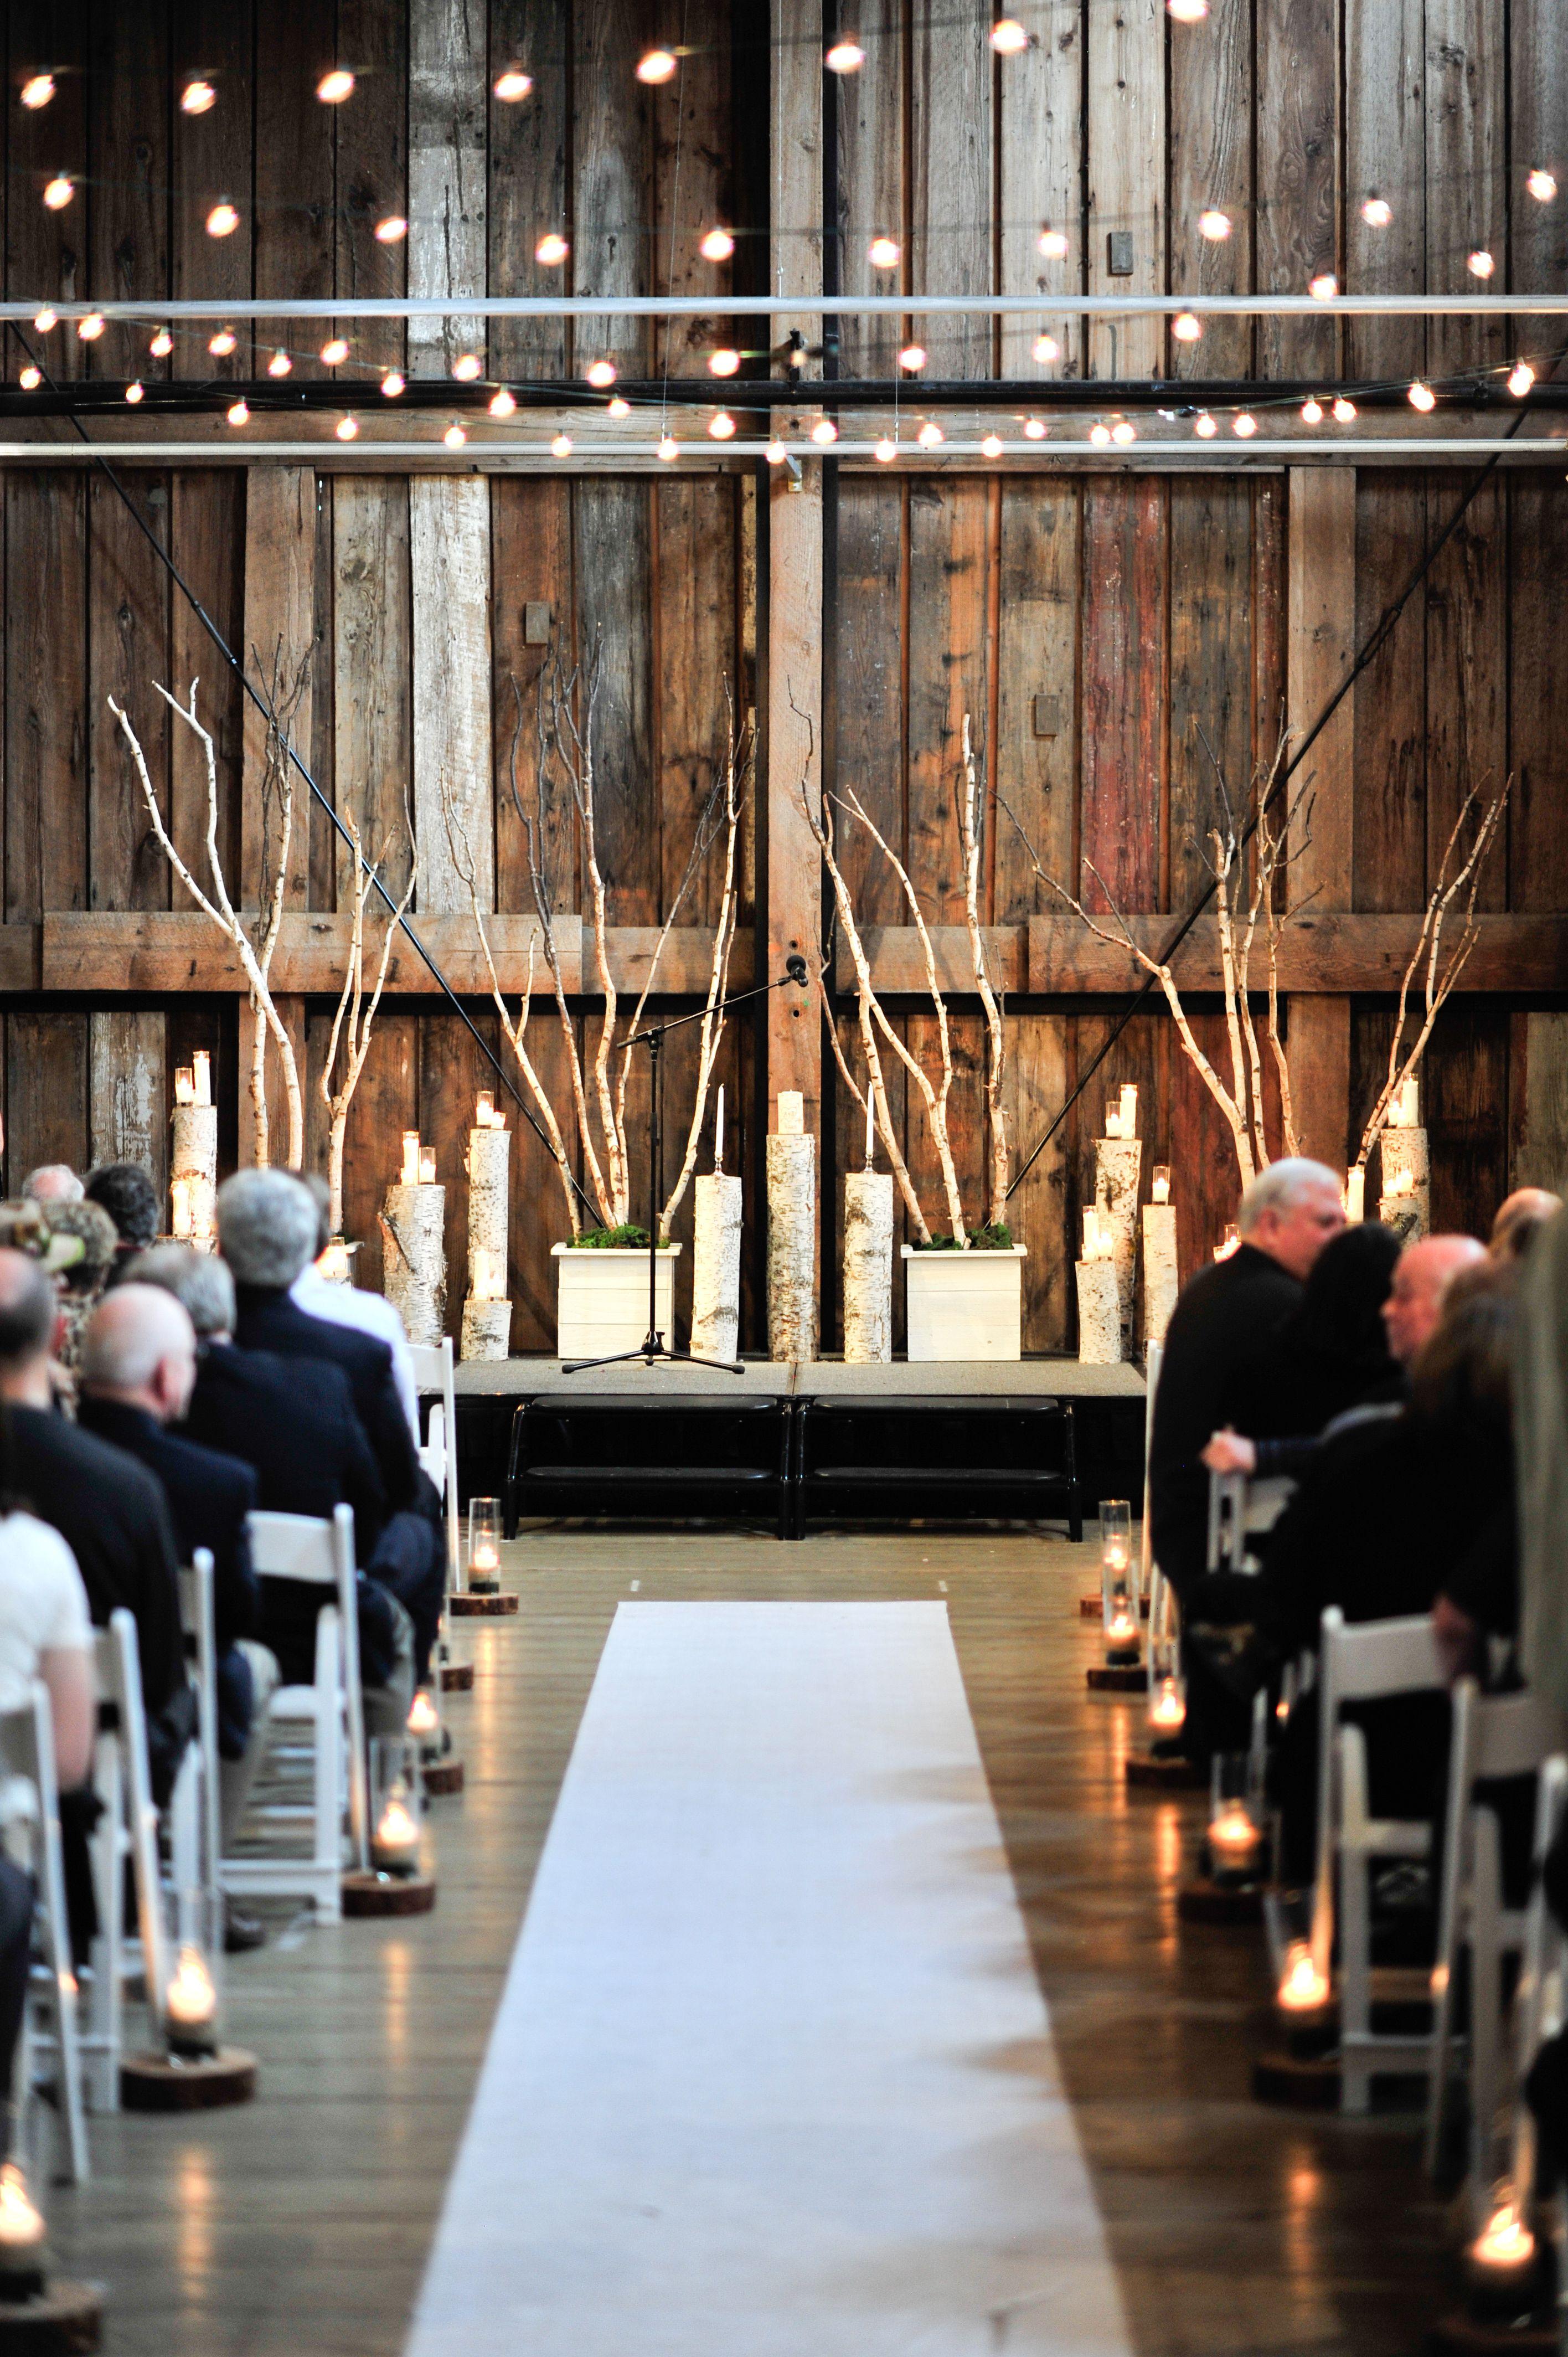 Issaquah Wa Photo Gallery Wedding Venues Long Island Rustic Wedding Venues Barn Wedding